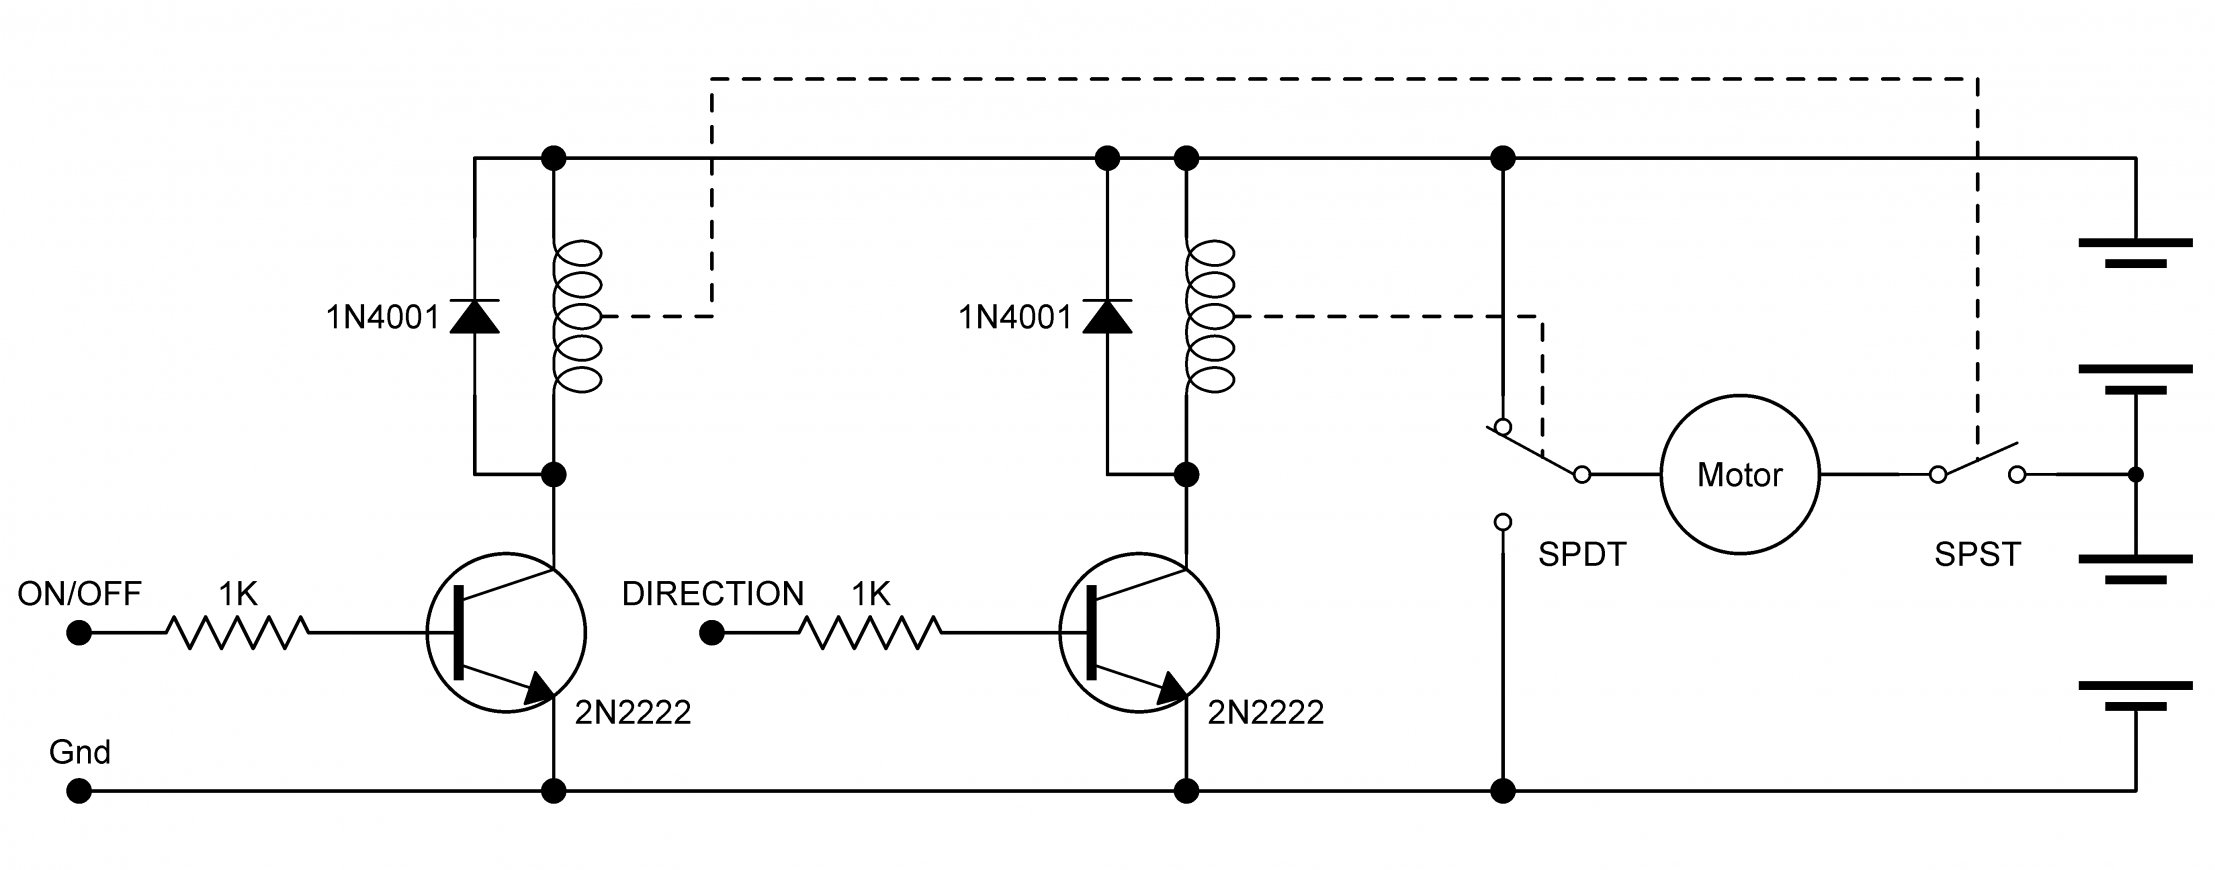 Square D 8 Pin Relay Wiring Diagram - Data Wiring Diagram Today - 8 Pin Relay Wiring Diagram